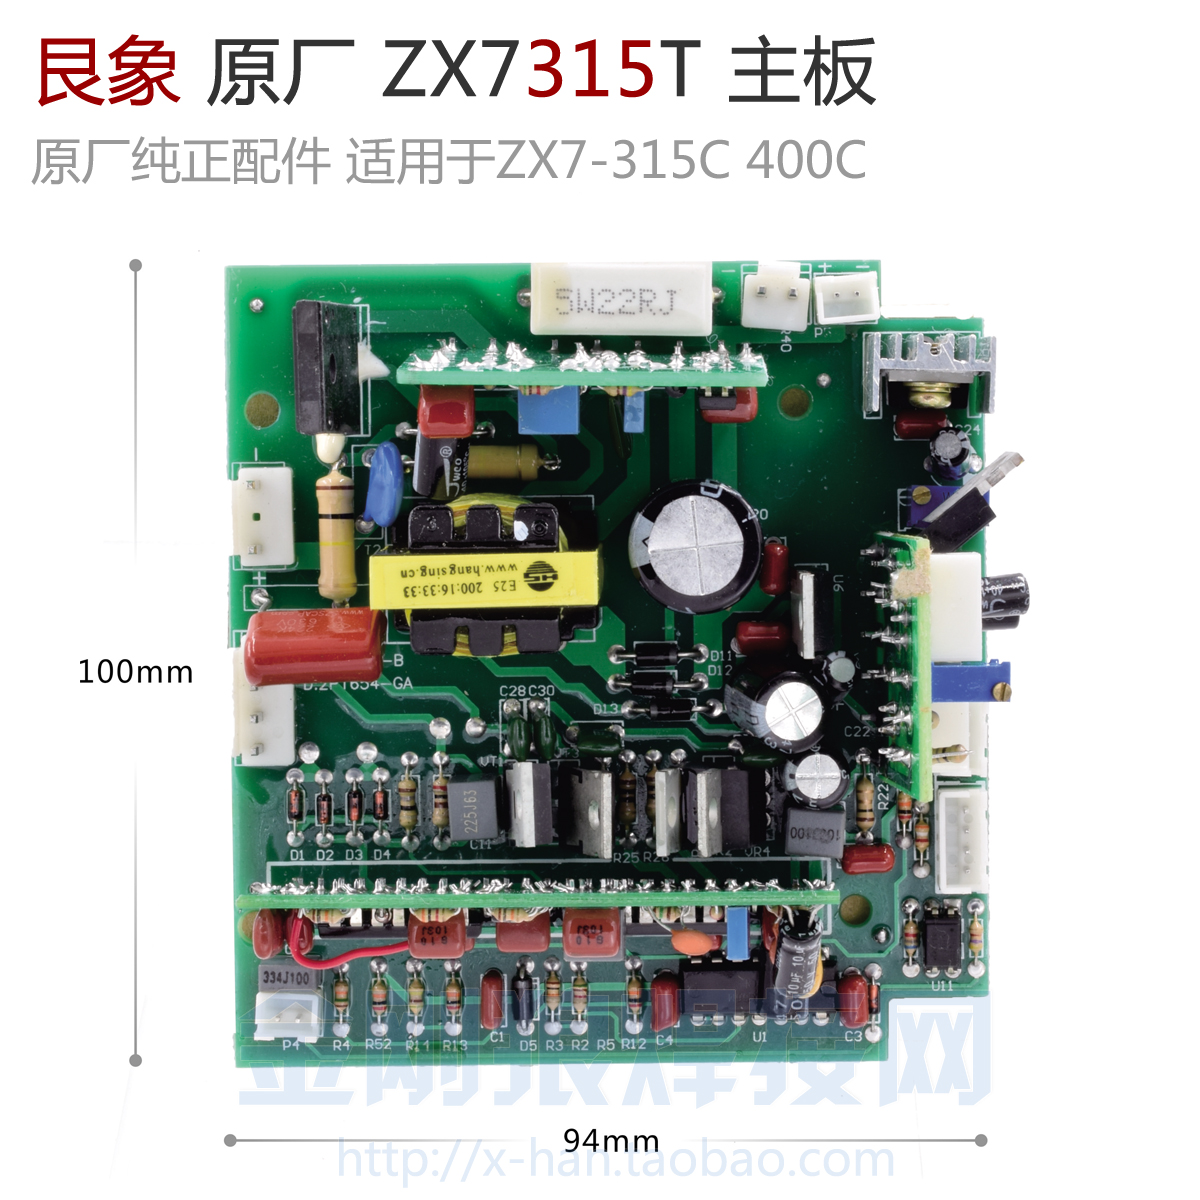 YDT ZX7-315T 315C 400C IGBT inverter welding machine auxiliary power motherboard control panel цены